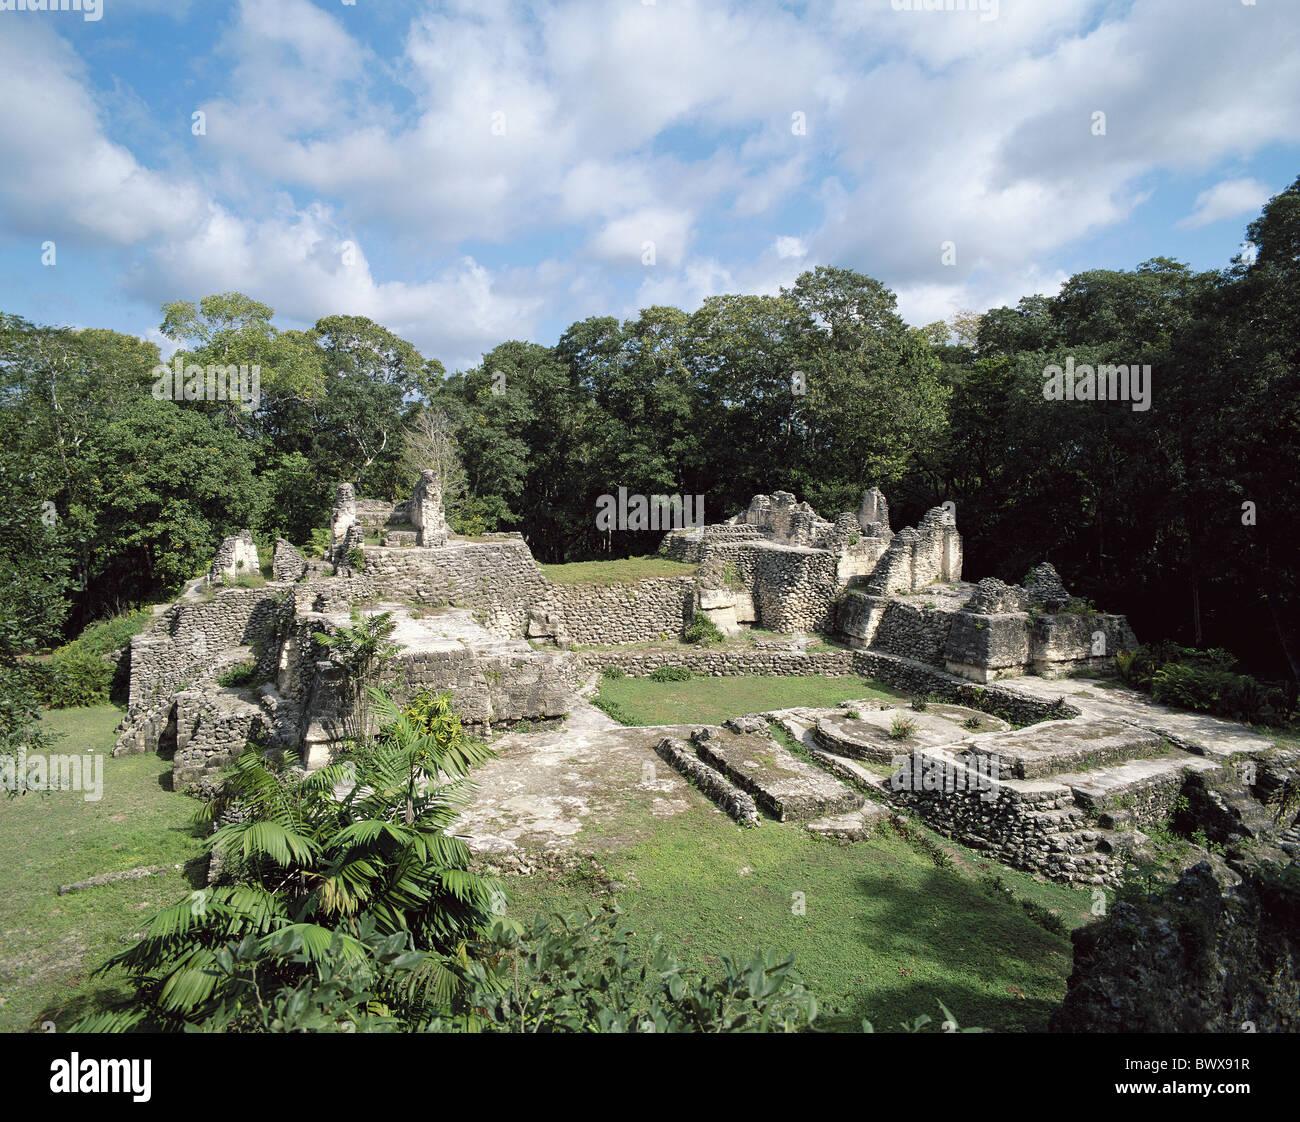 South America Guatemala culture Maya culture ruins temple stairs Uaxactun vegetation - Stock Image